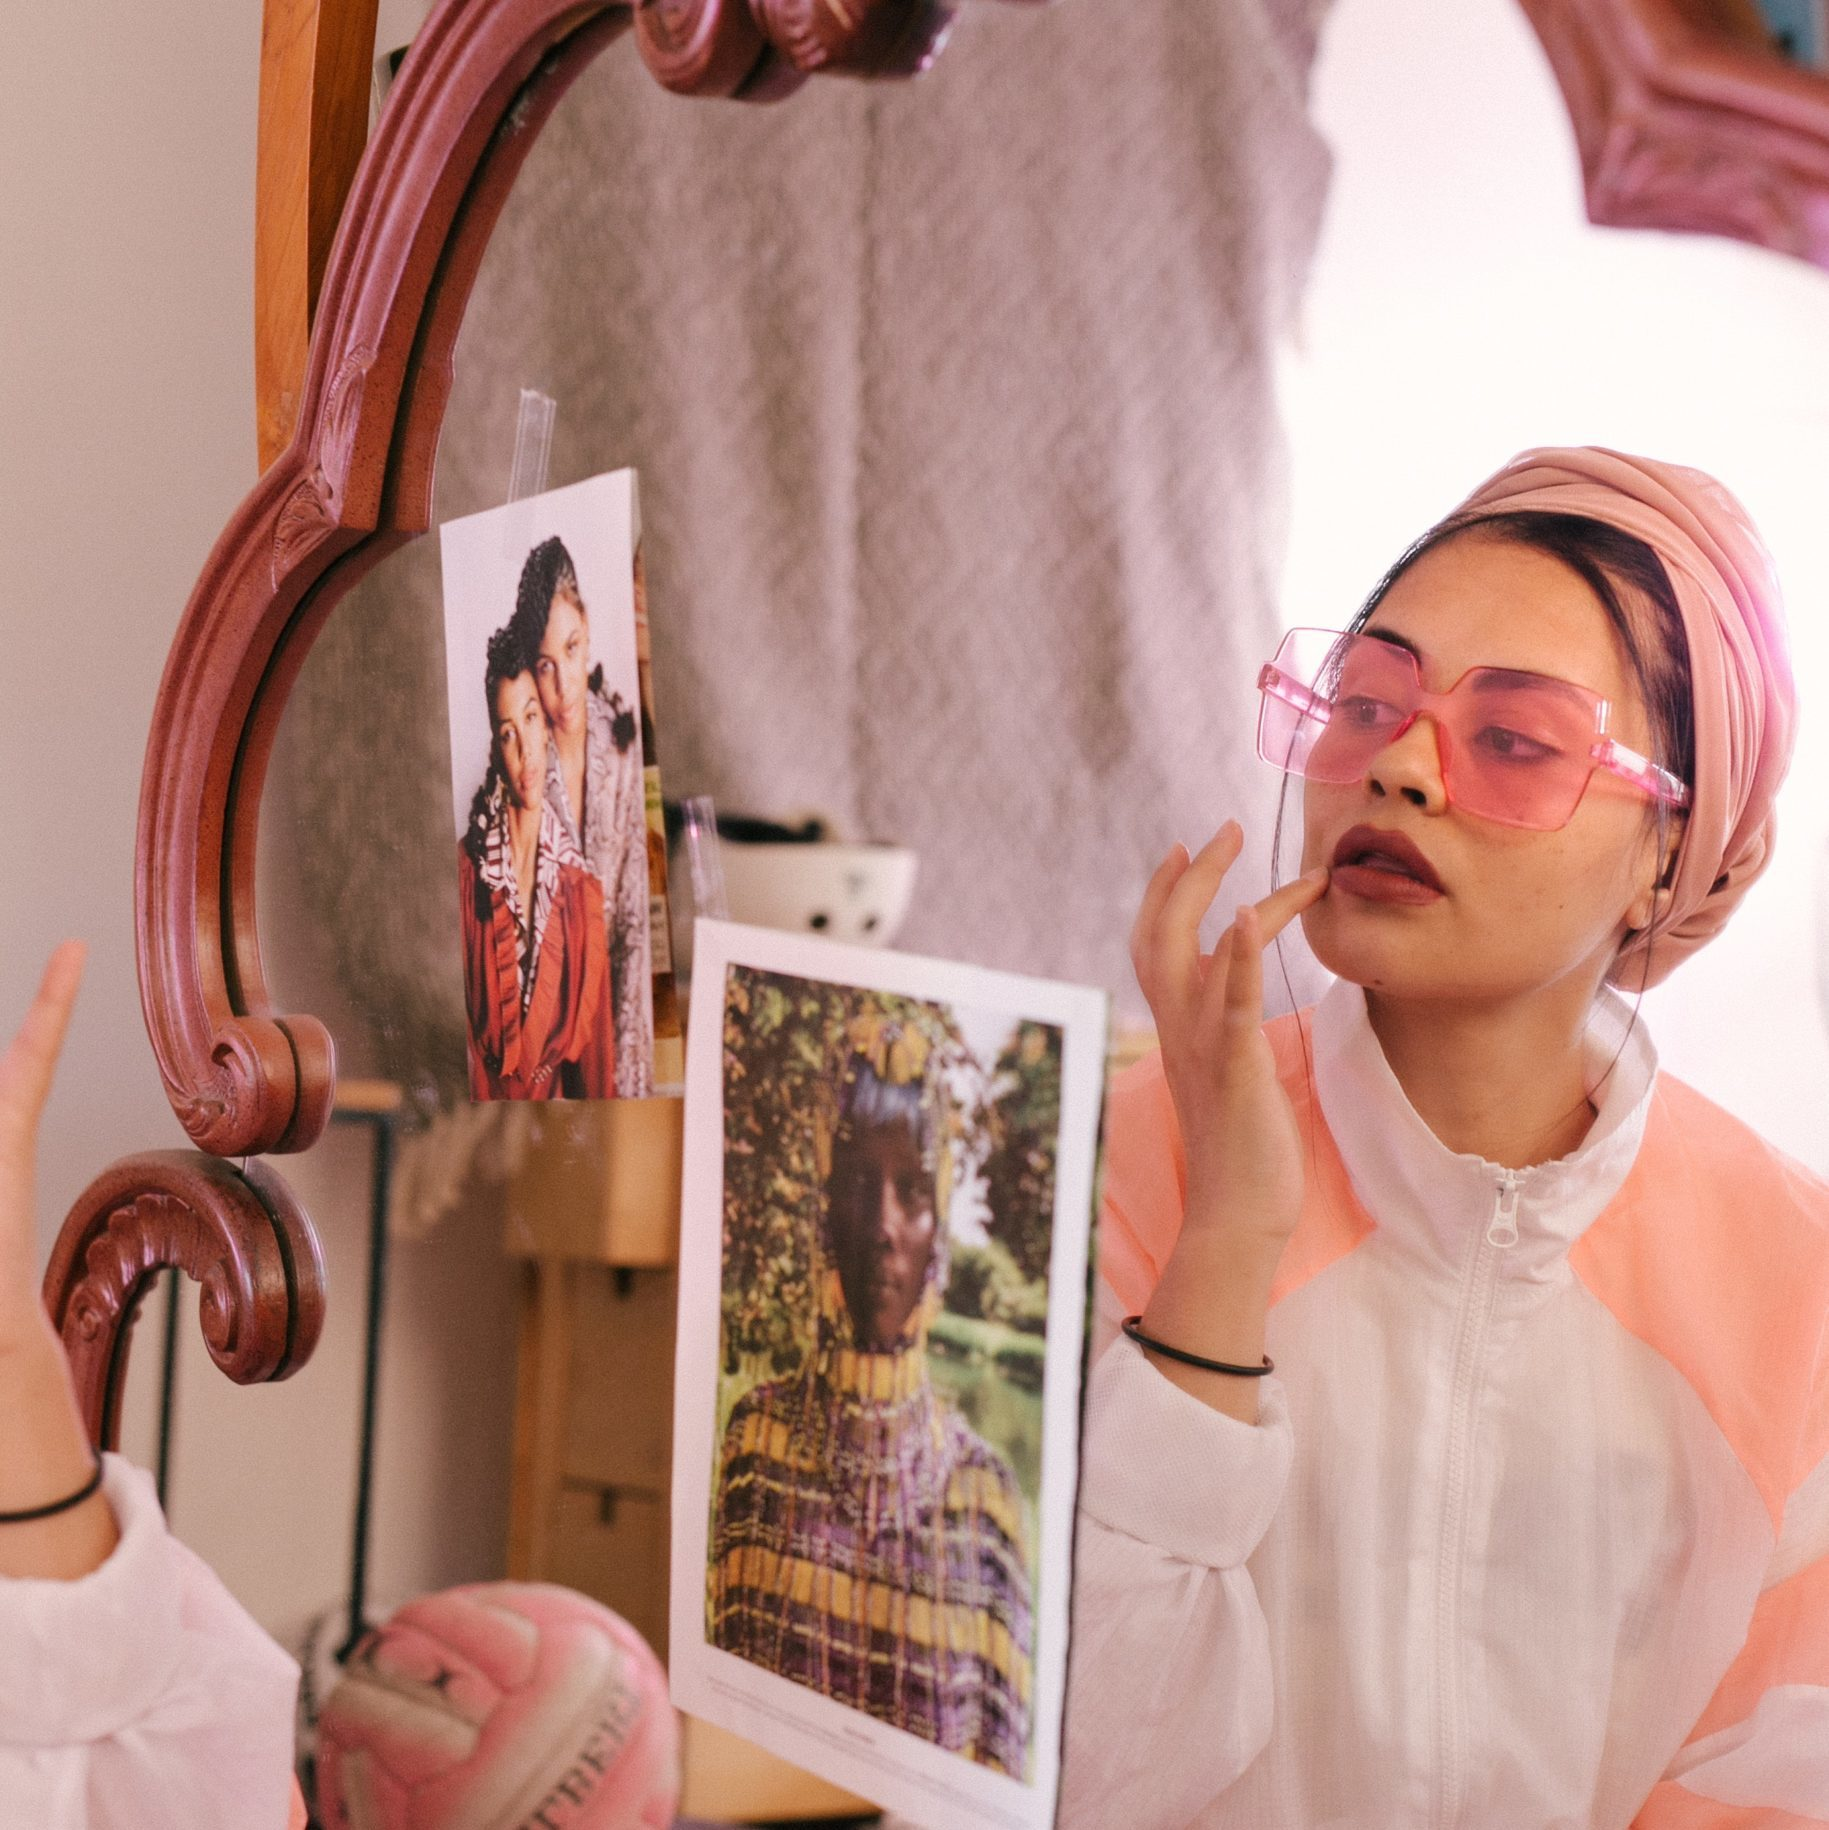 https://rozetluistervoer.nl/podcast-categorie/beauty-fashion/